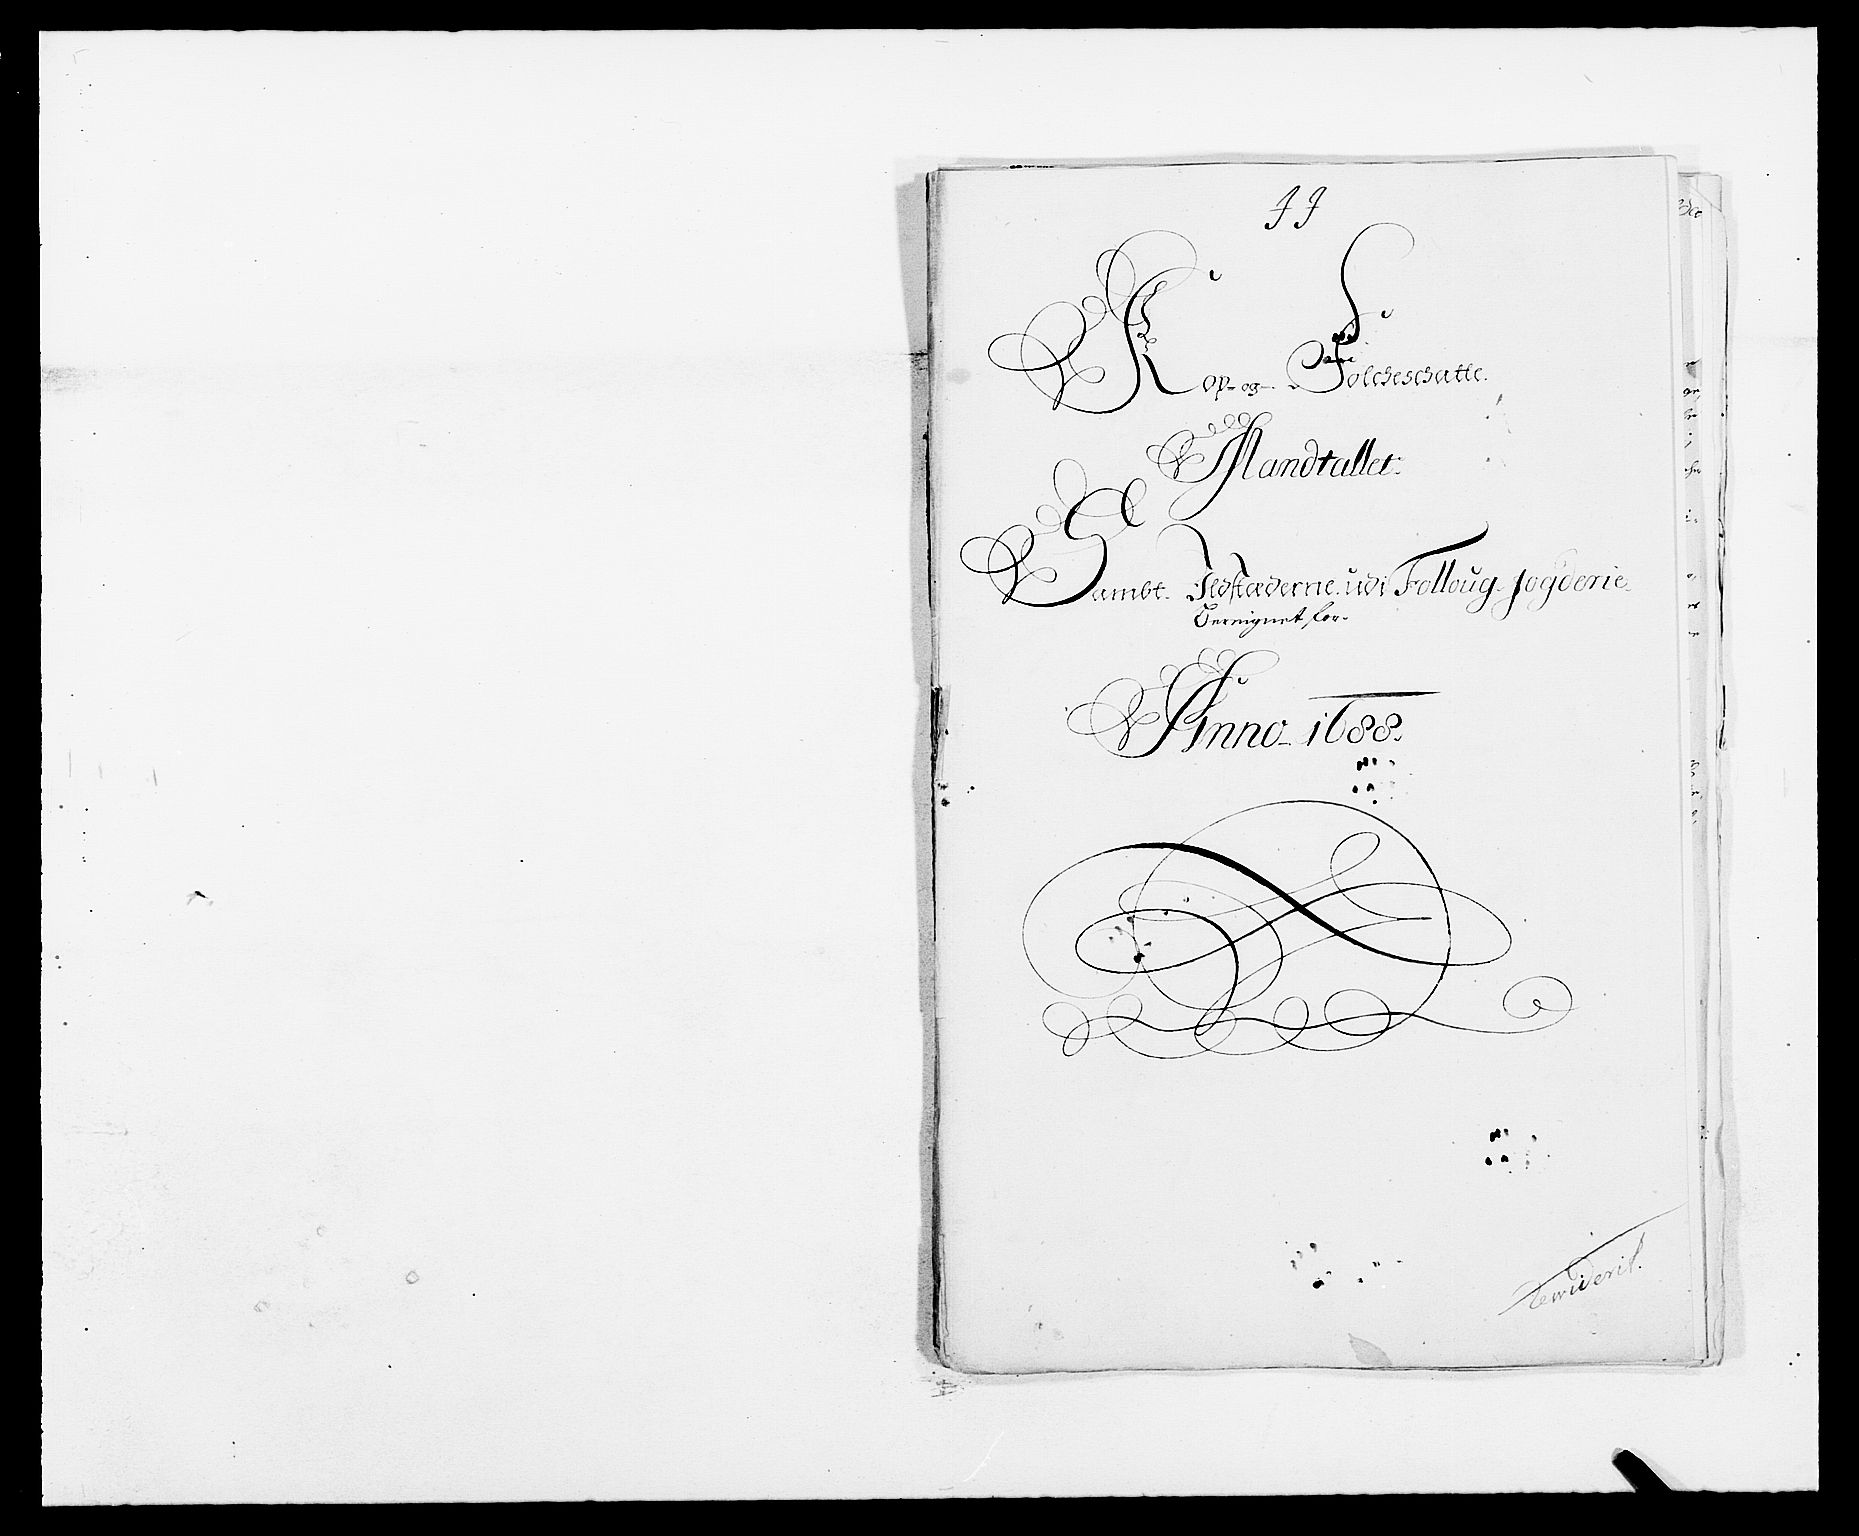 RA, Rentekammeret inntil 1814, Reviderte regnskaper, Fogderegnskap, R09/L0434: Fogderegnskap Follo, 1687-1688, s. 382